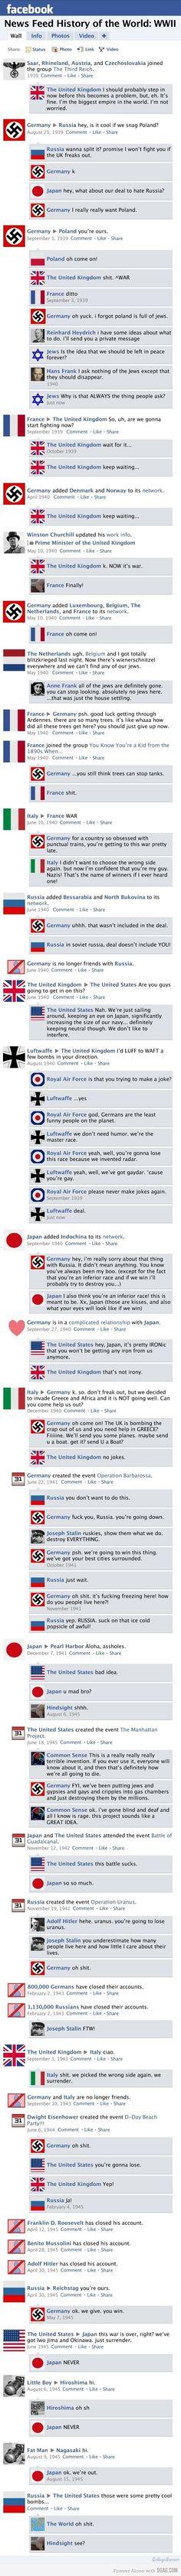 WW2 Facebook